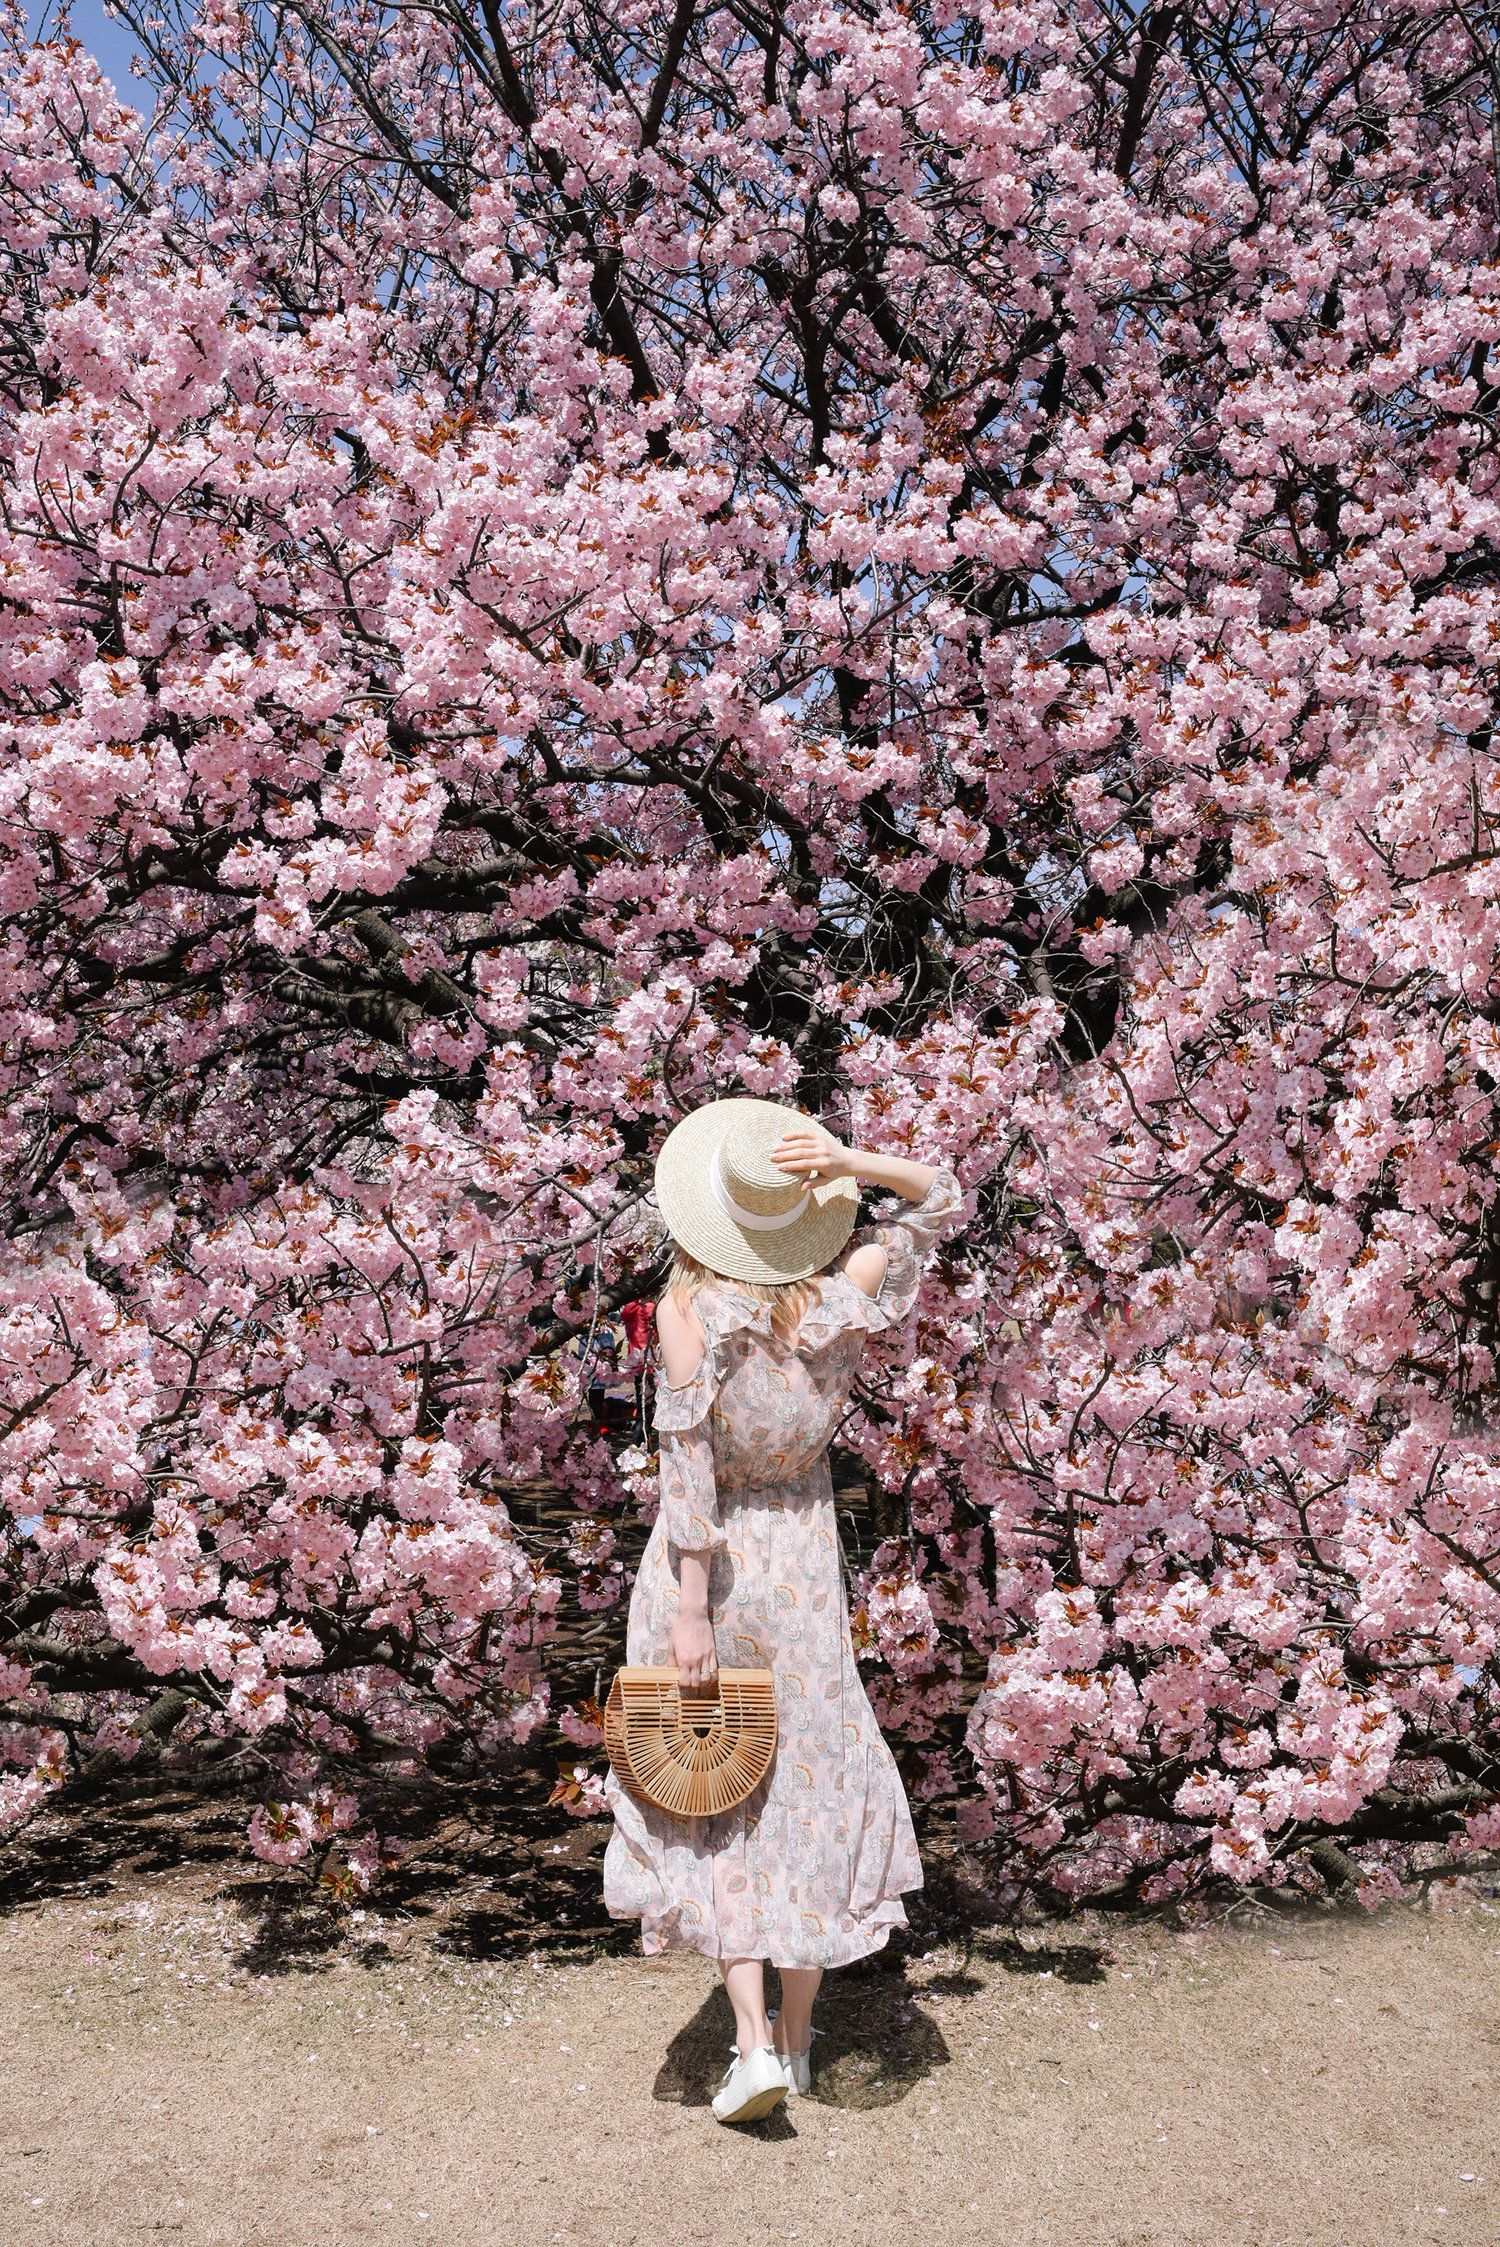 Shinjuku Gyoen Park Tokyo Full Bloom Sakura Cherry Blossoms Japan Pink Spring Cherry Blossoms A Compl Japan Spring Sakura Bloom Cherry Blossom Japan